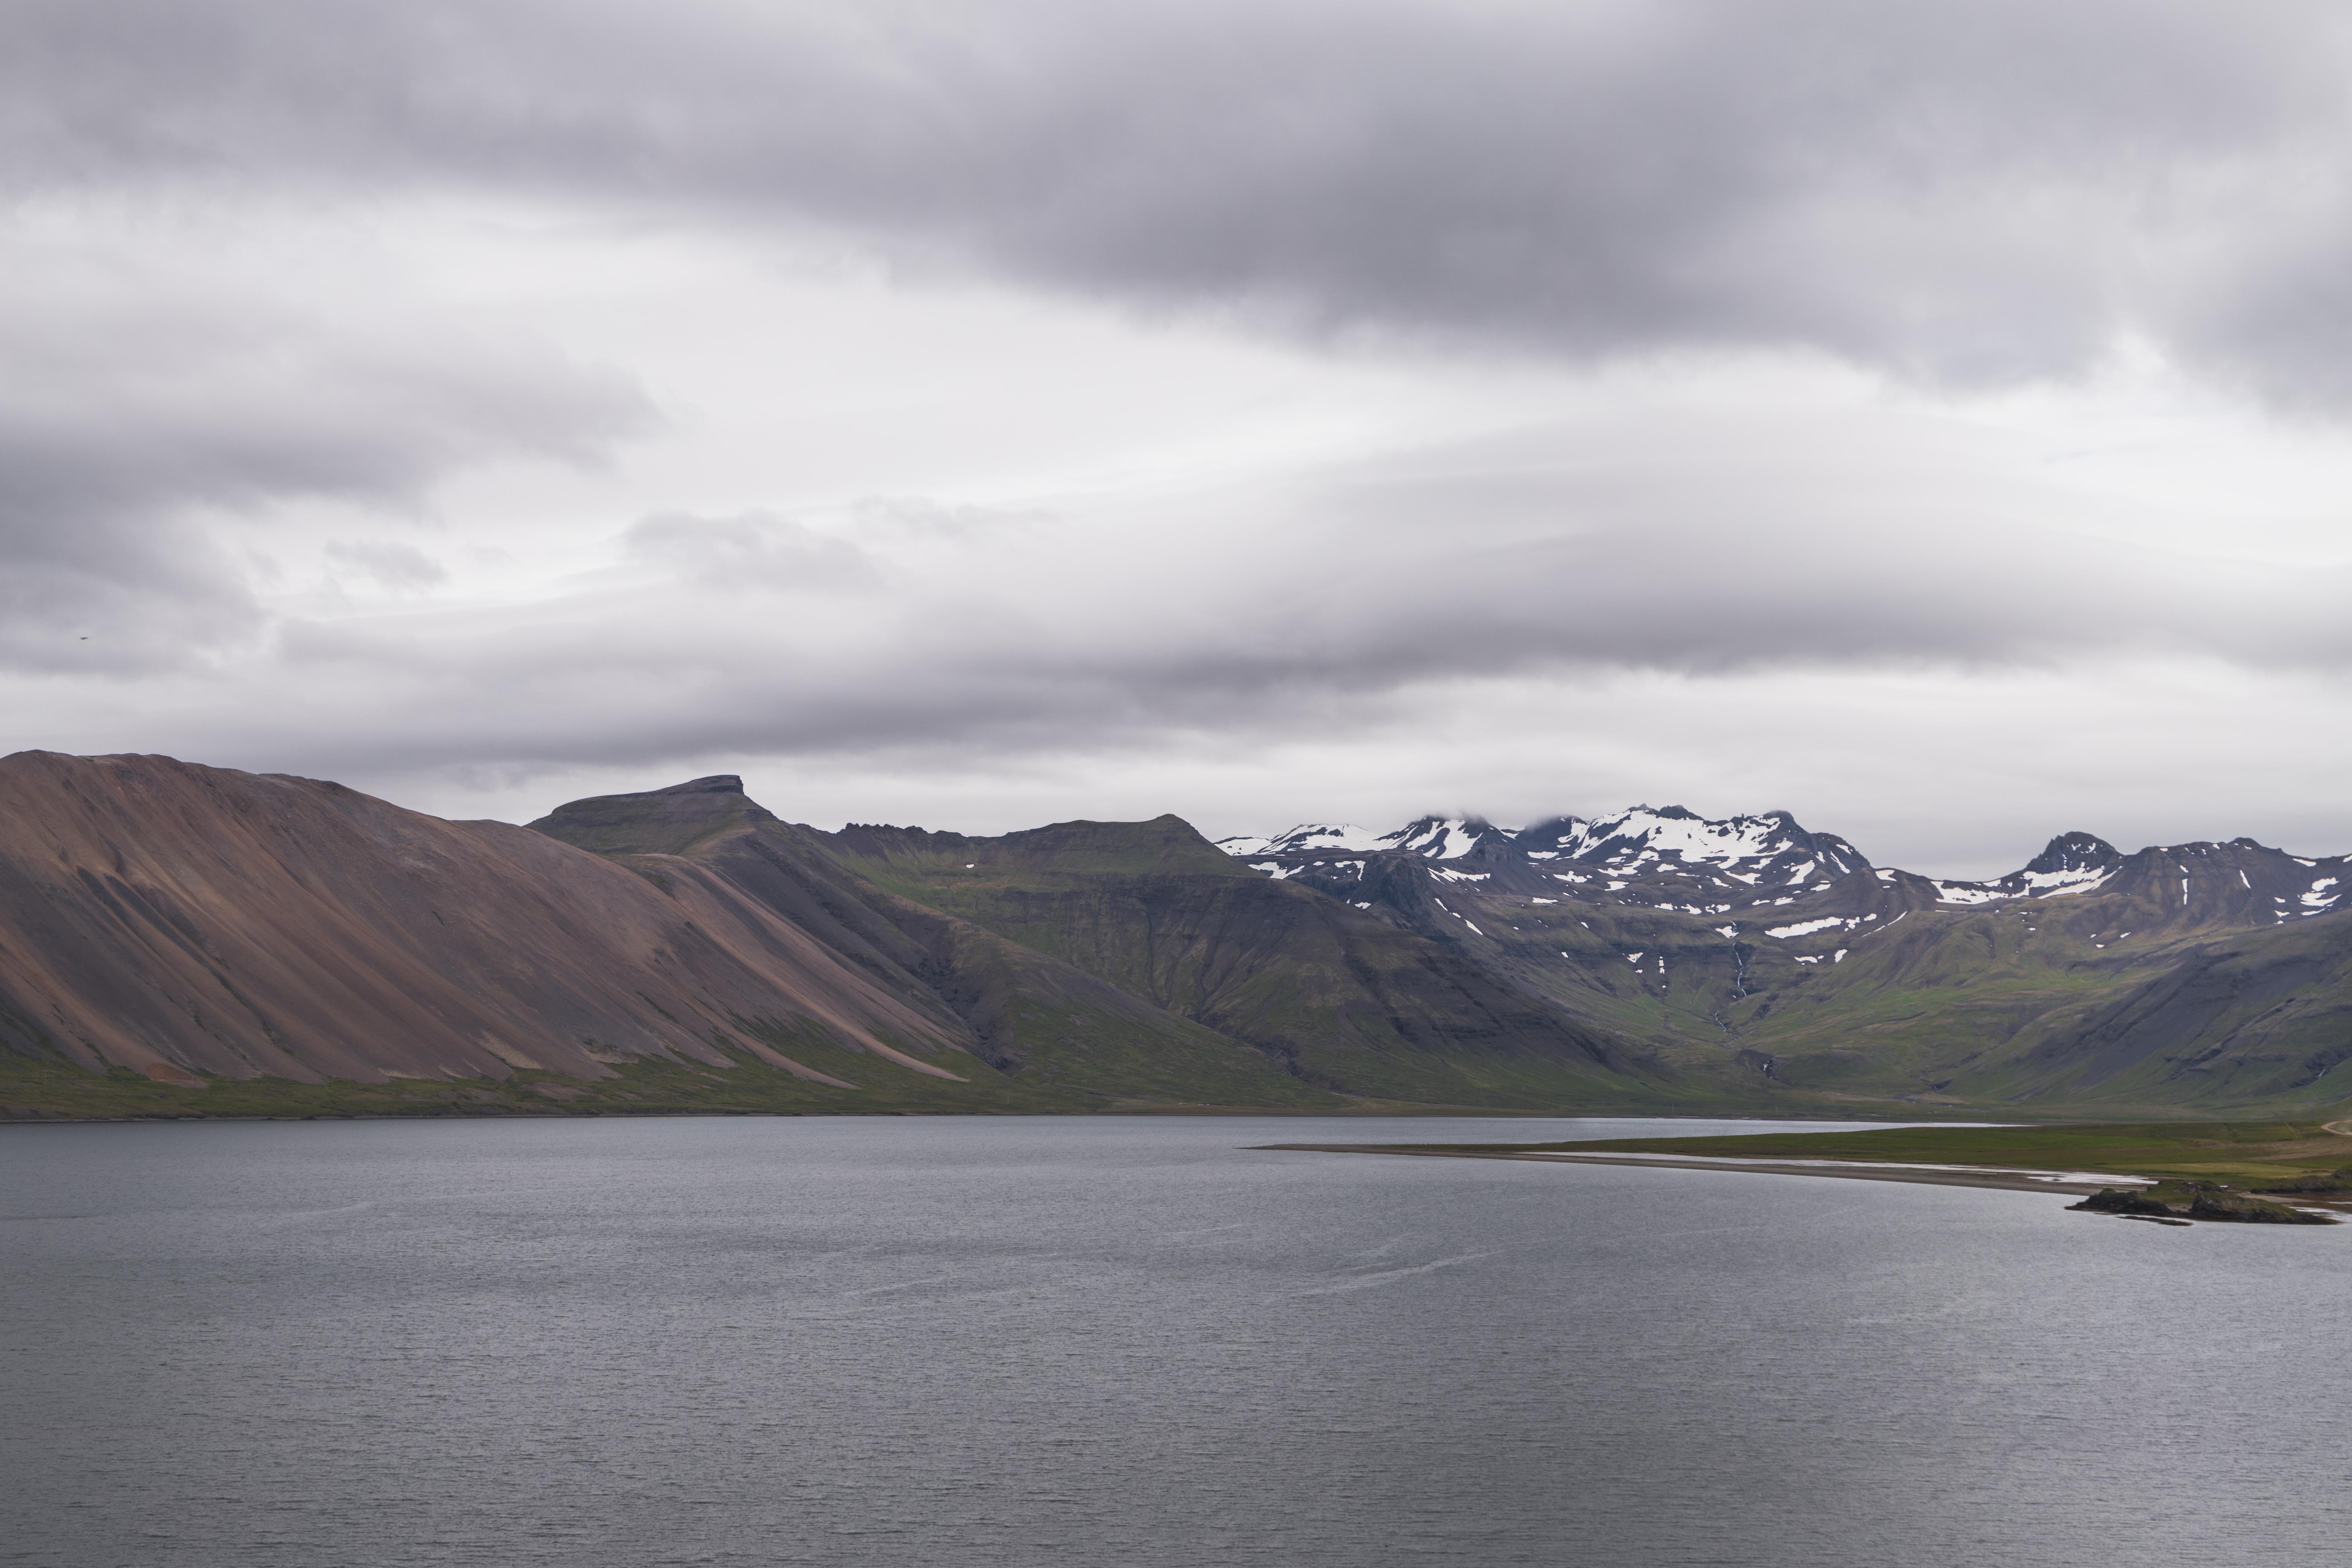 Islande | La péninsule du Snæfellsness